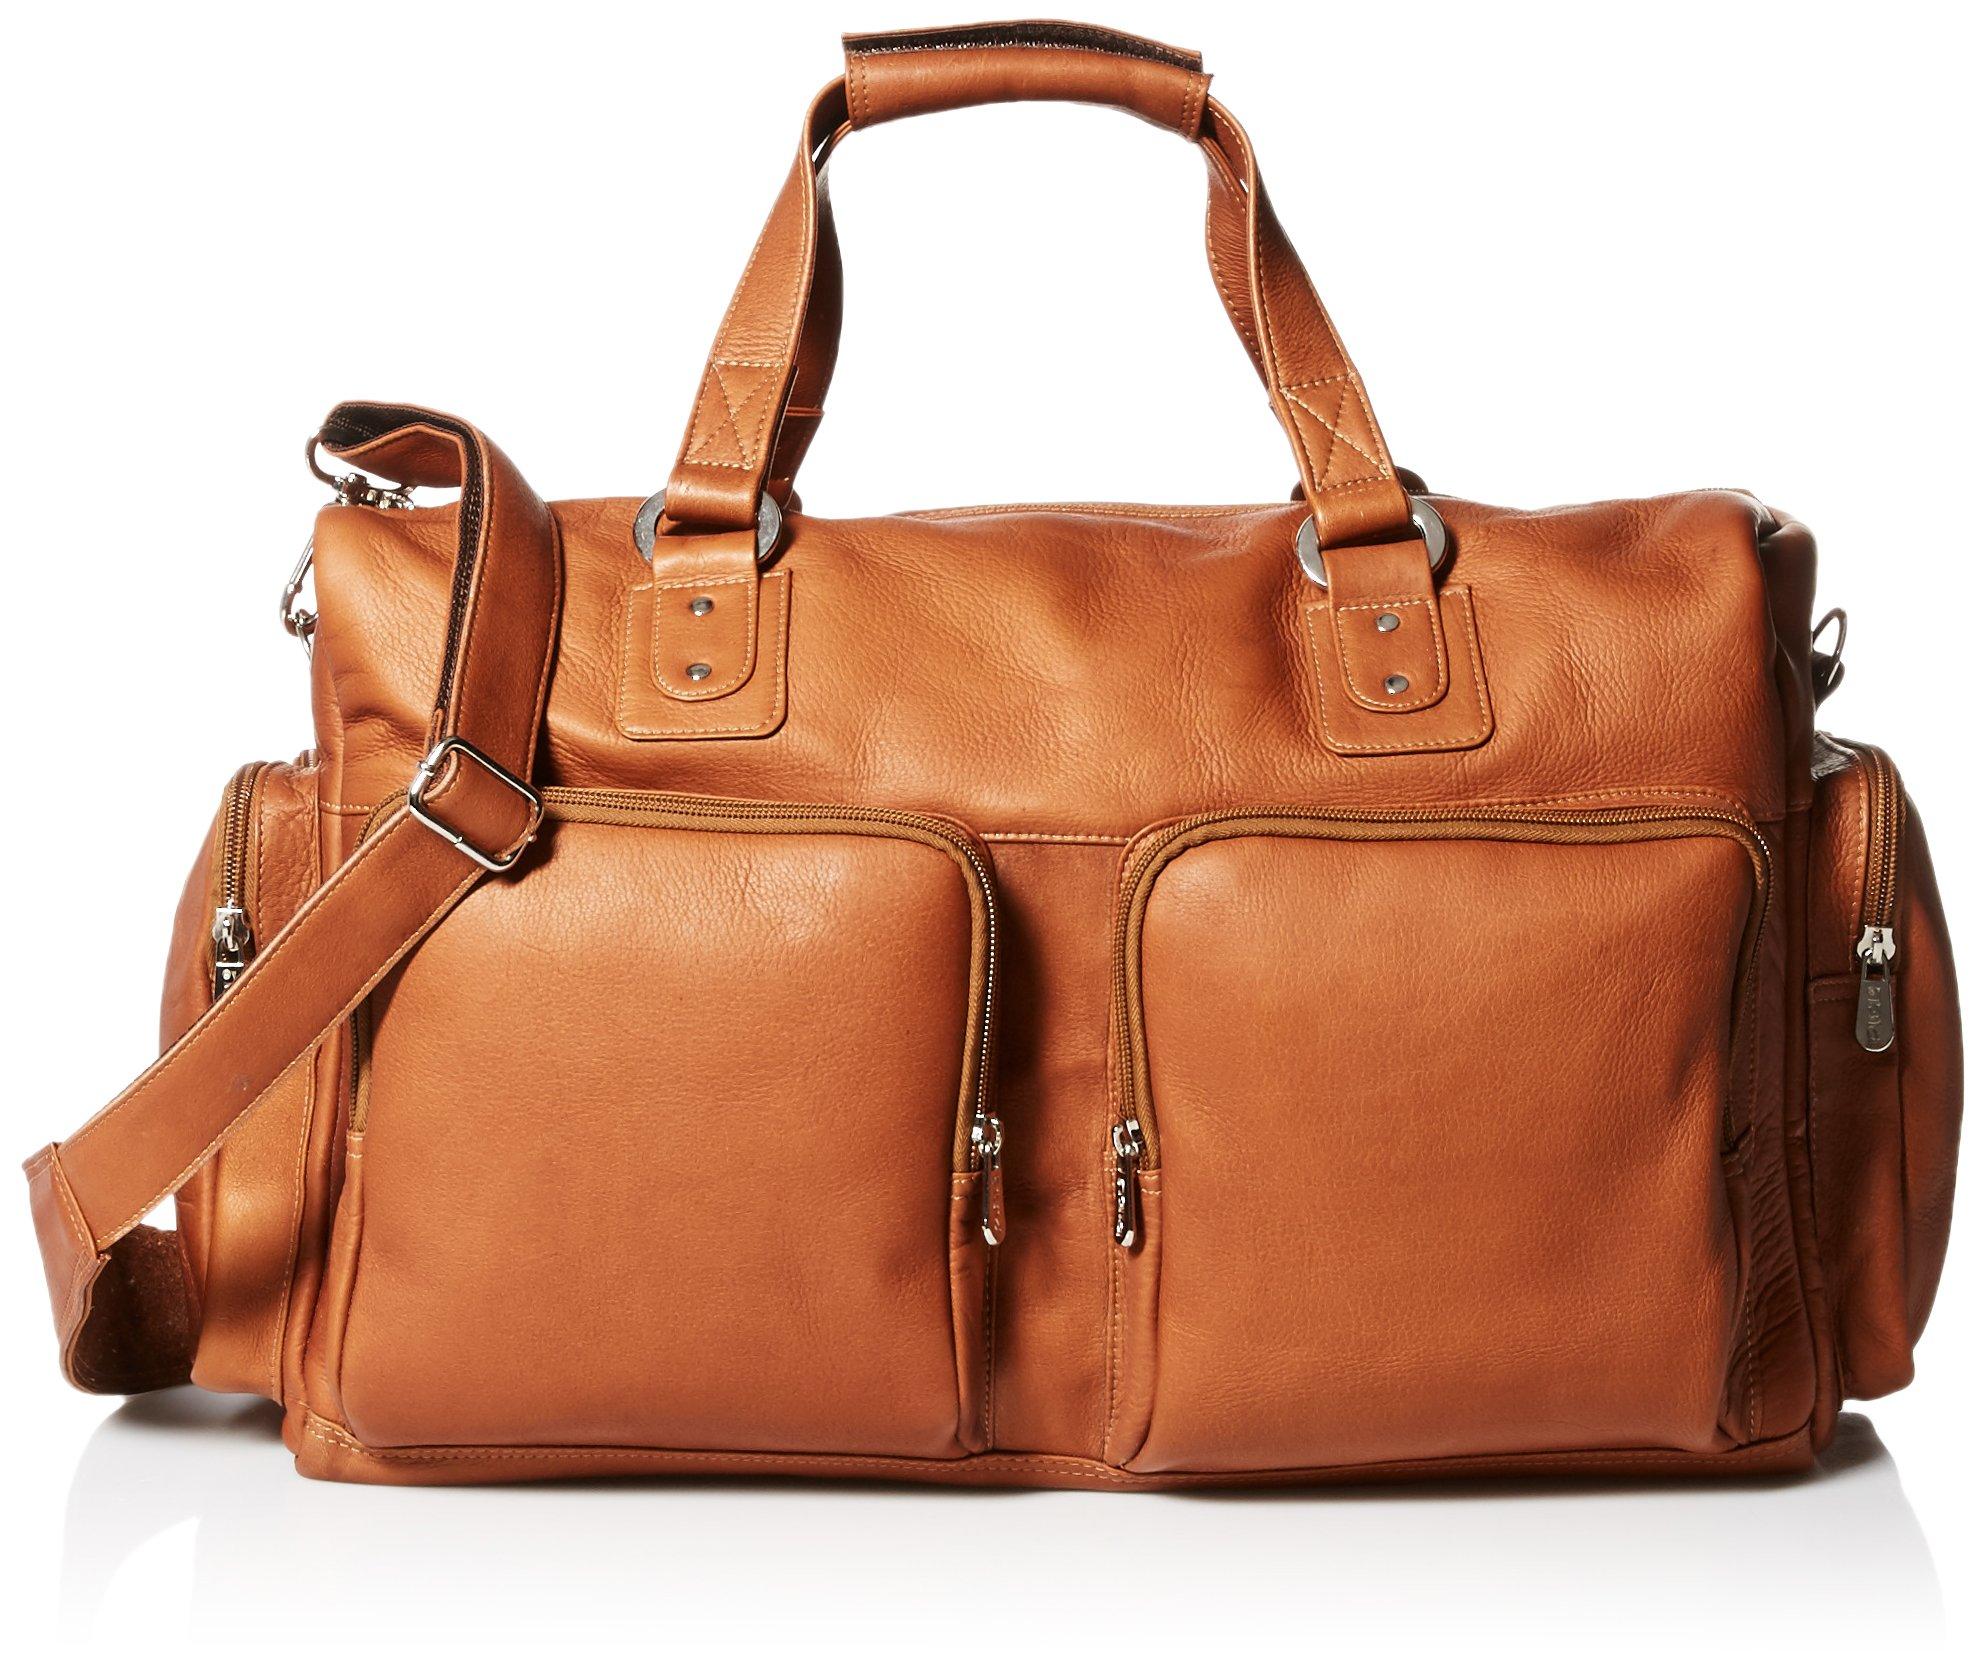 Piel Leather Multi-Pocket Leather Carry-On, Saddle, One Size